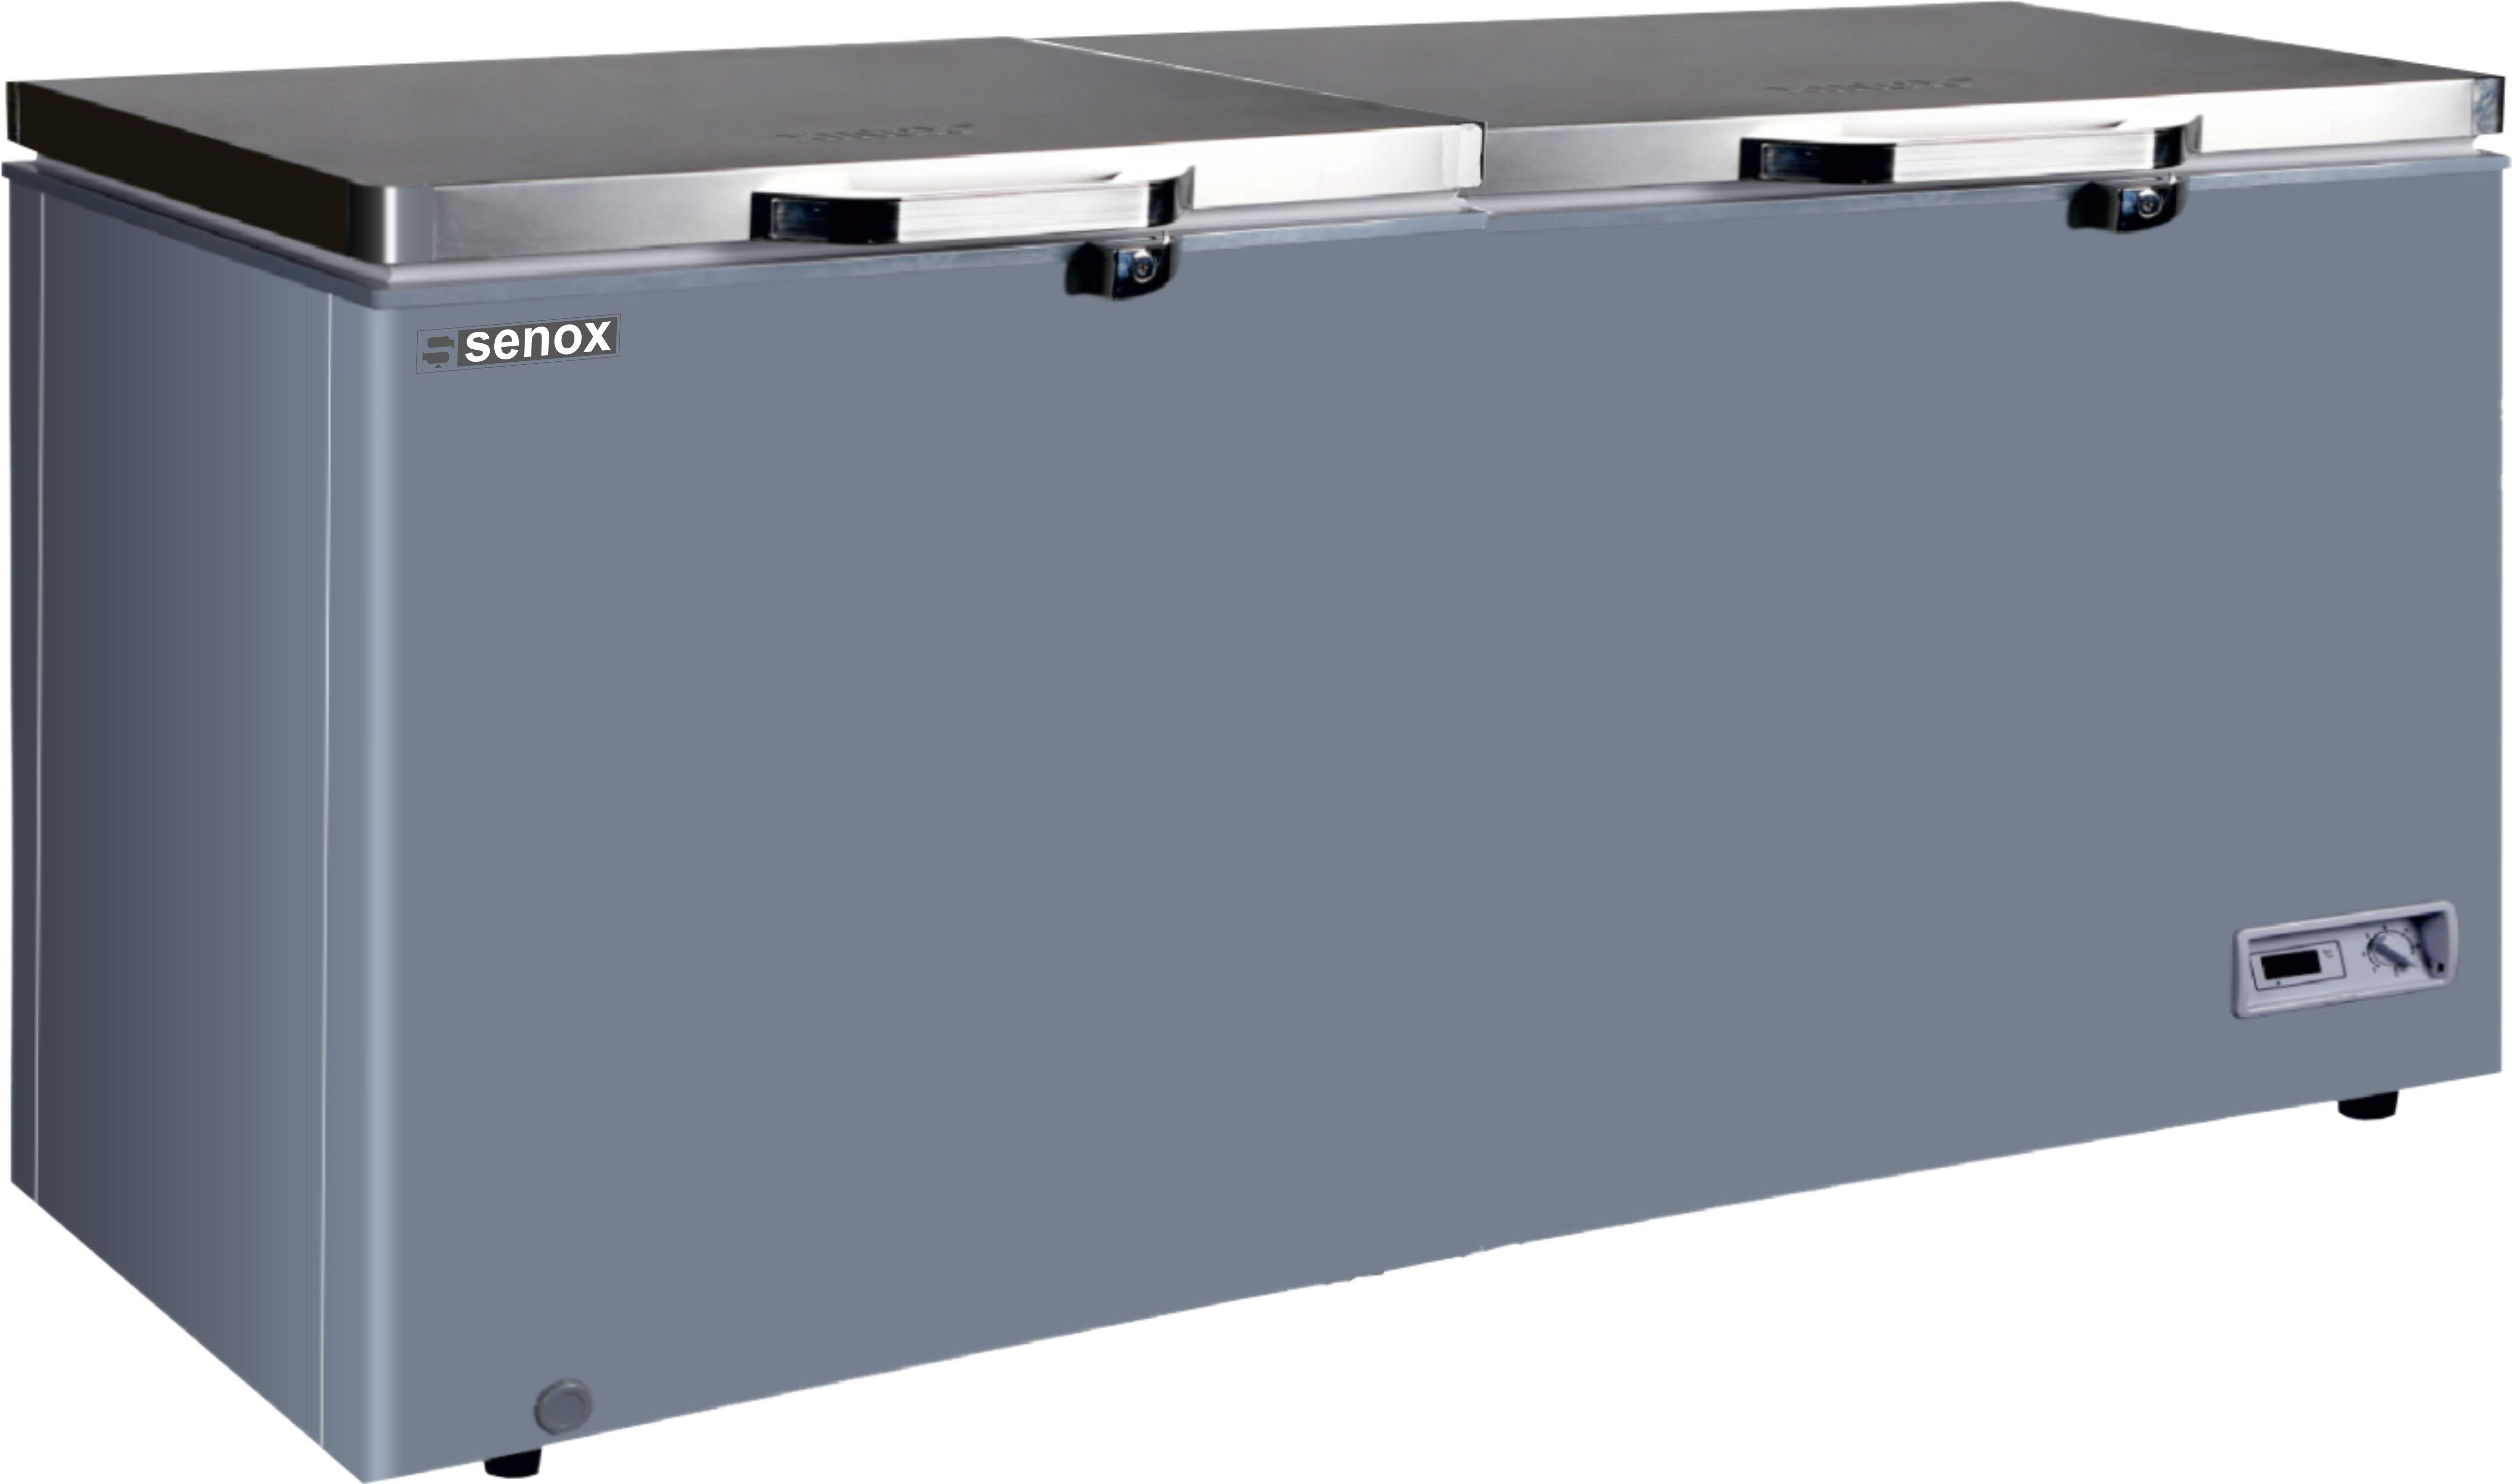 senox-bd-800